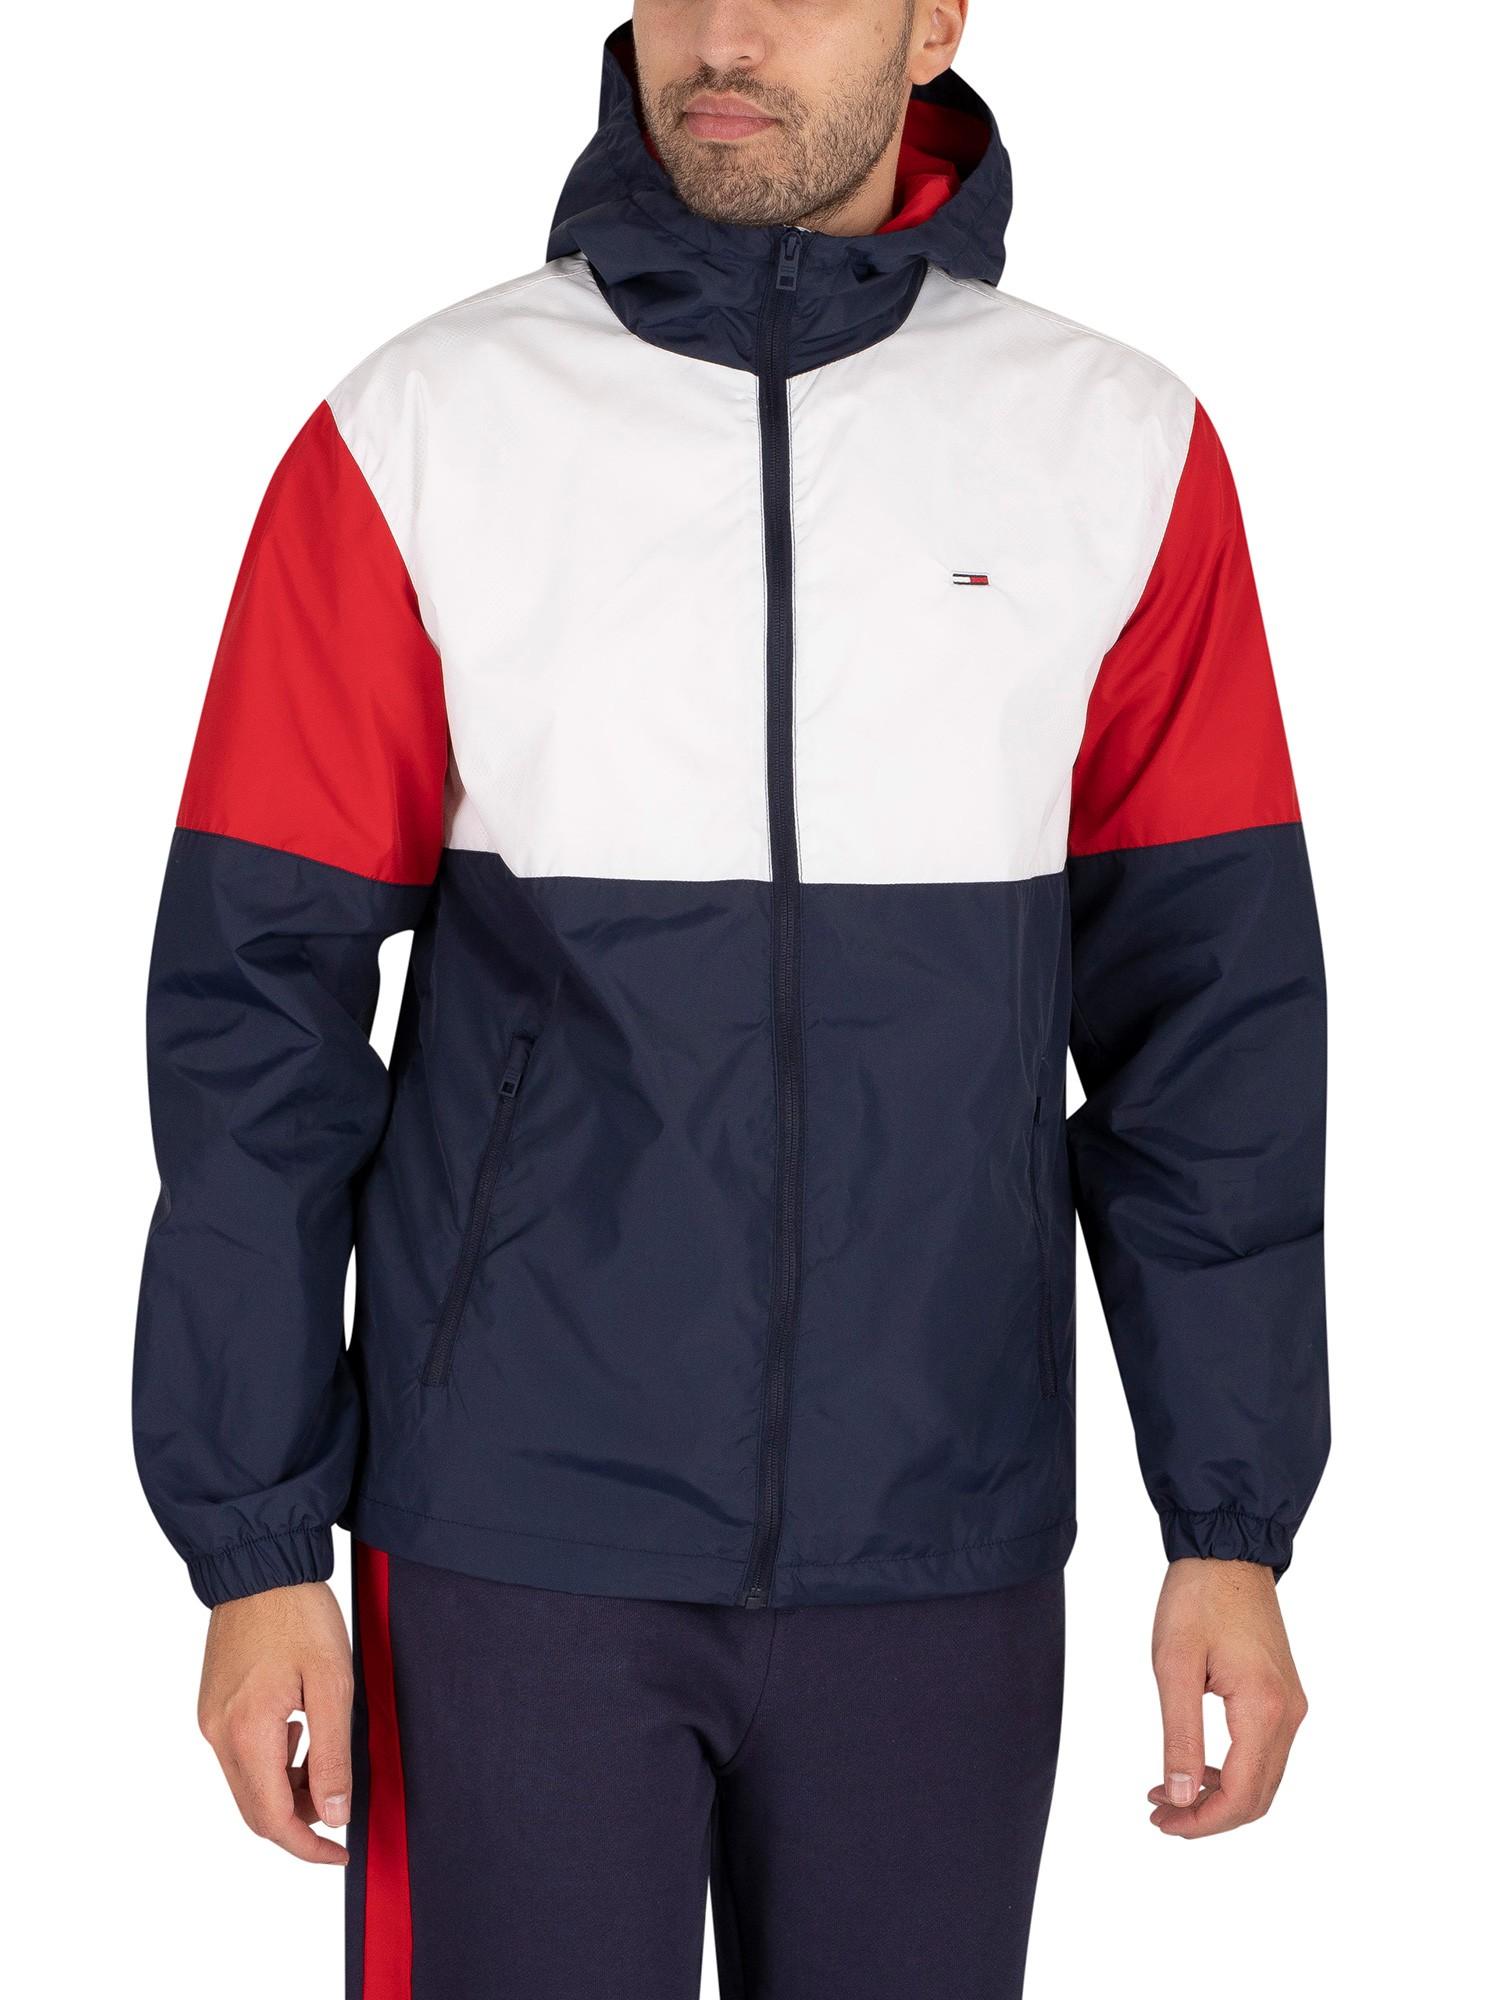 Nylon Colourblock Windbreaker Jacket